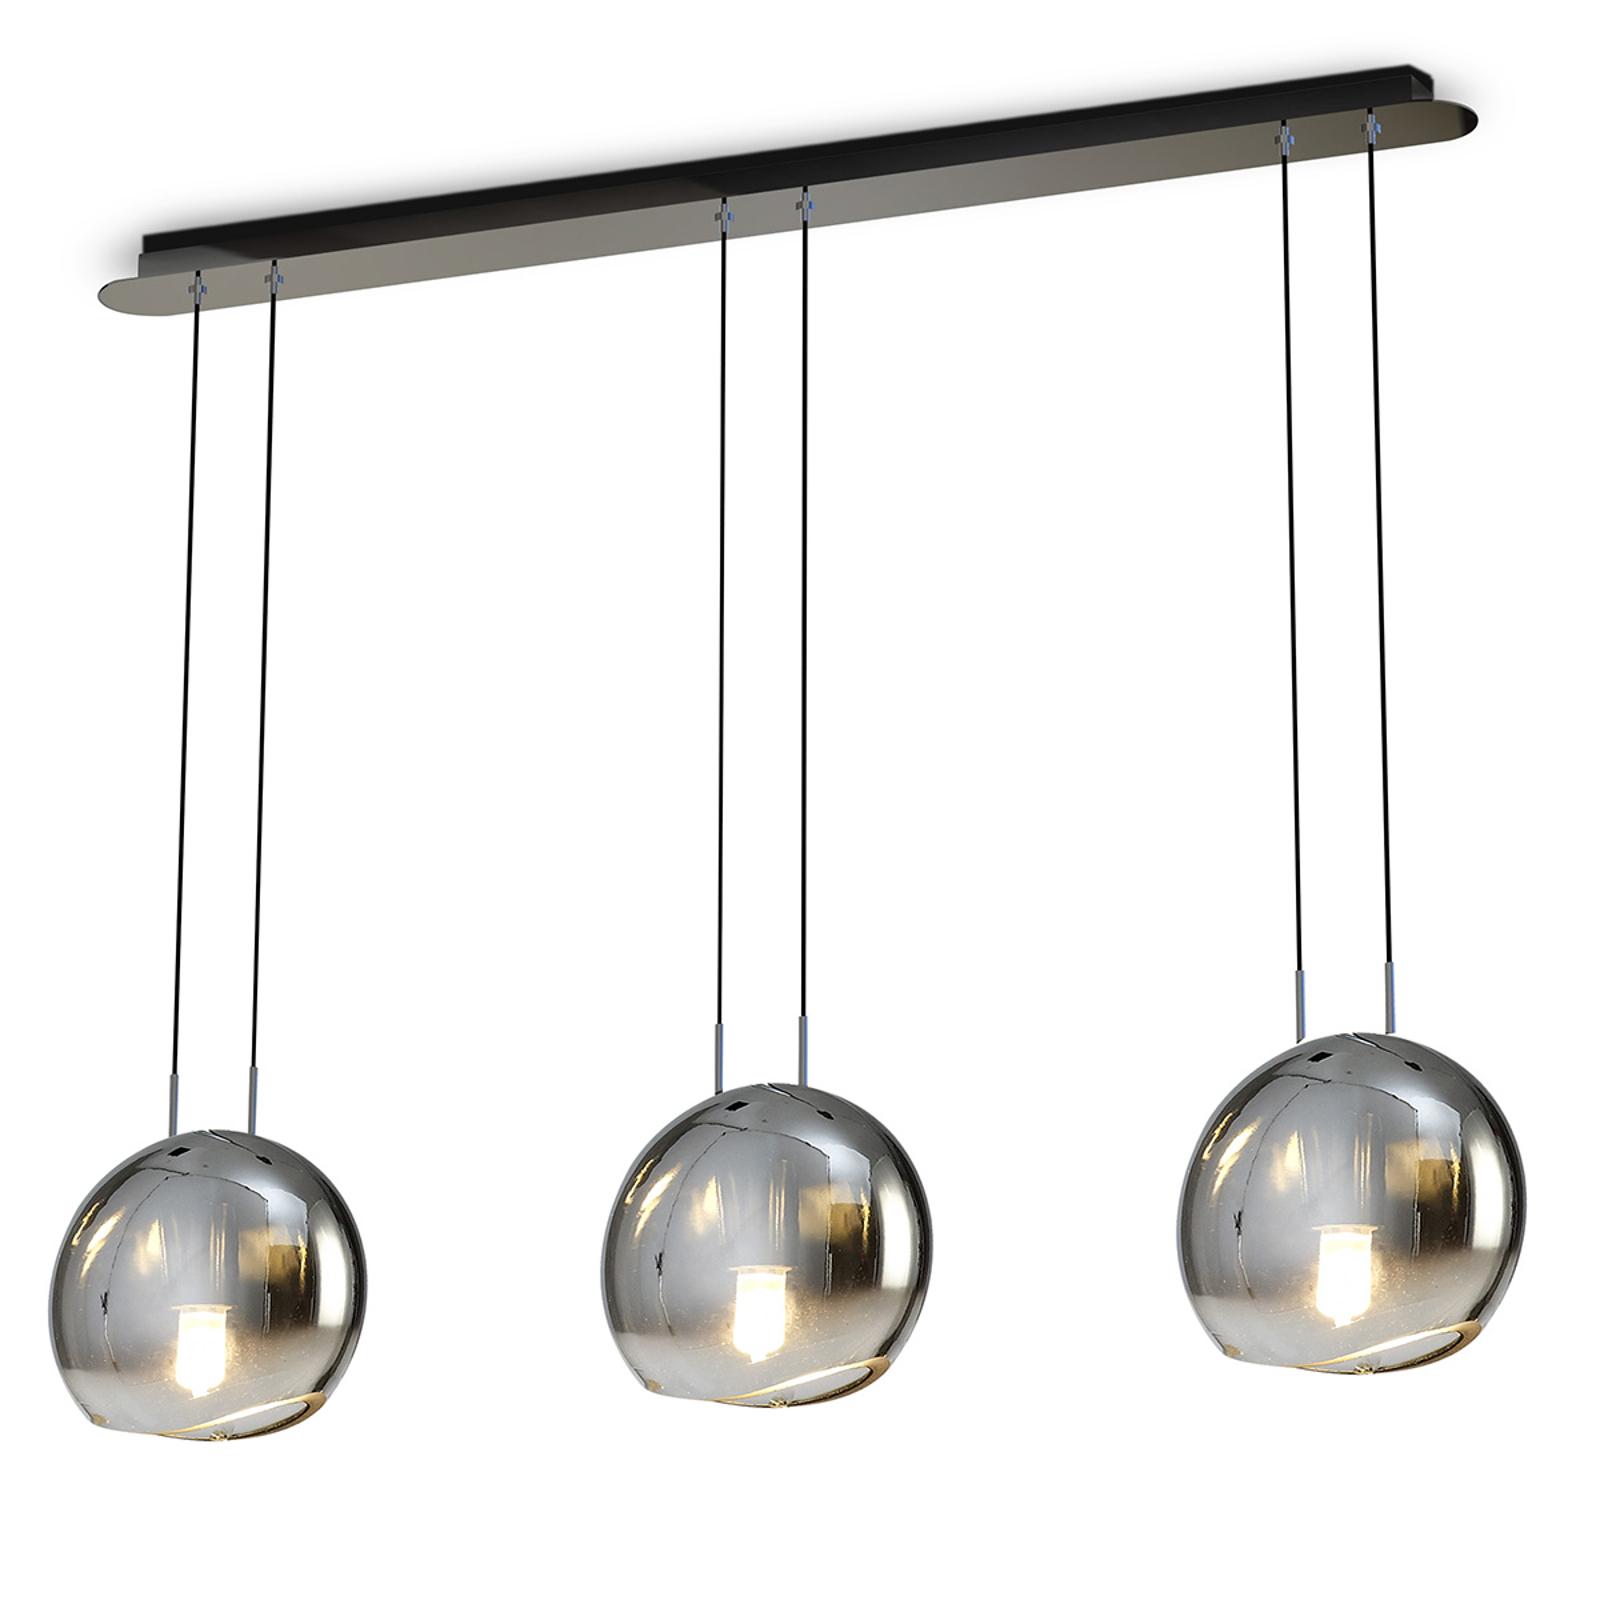 Hanglamp Lens m. 3 lampjes en glazen lampenkappen